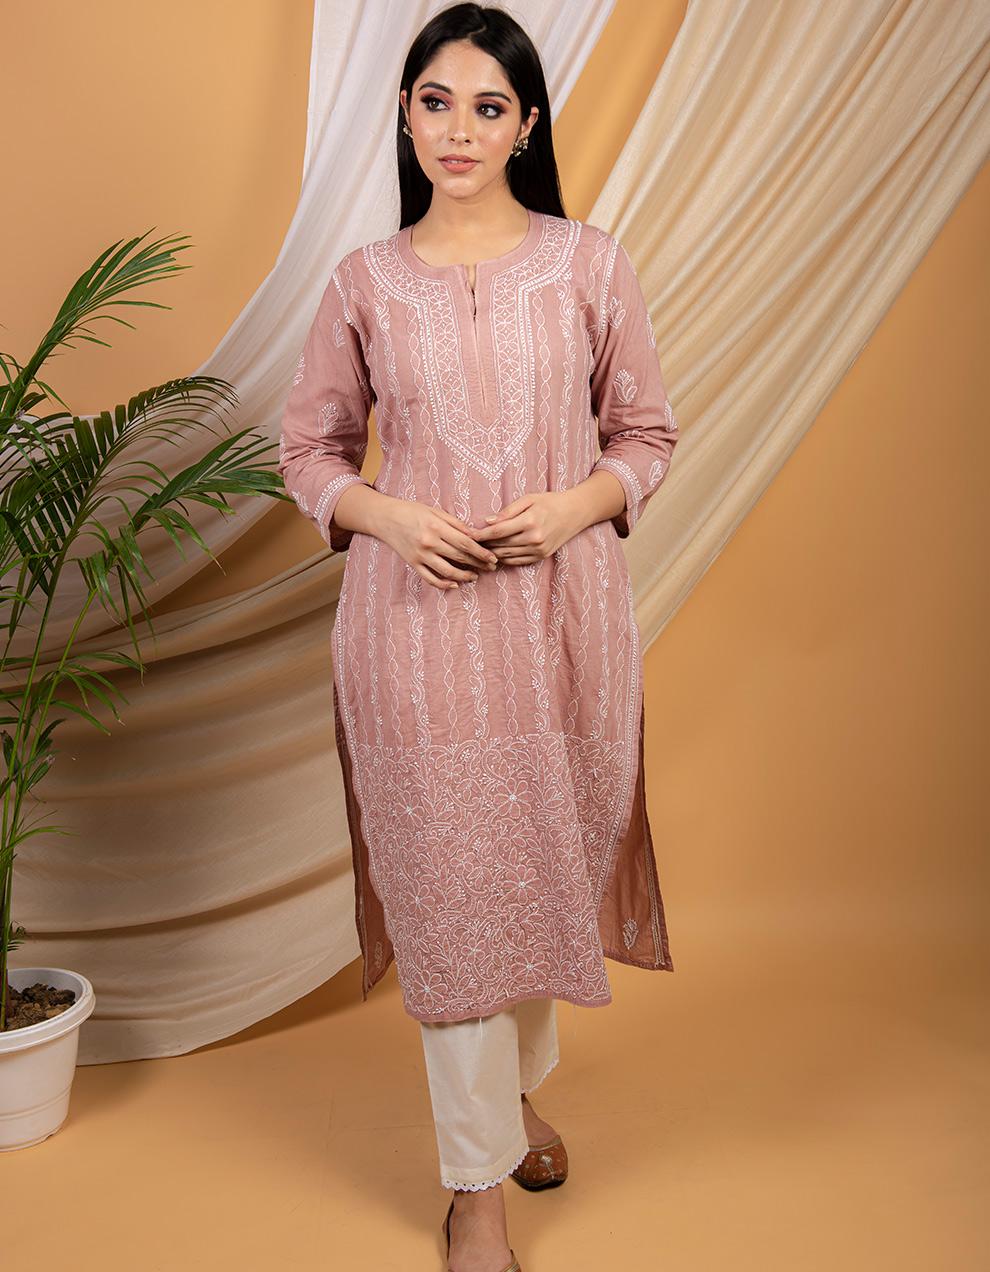 Fiza Dusty pink chikankari cotton kurta